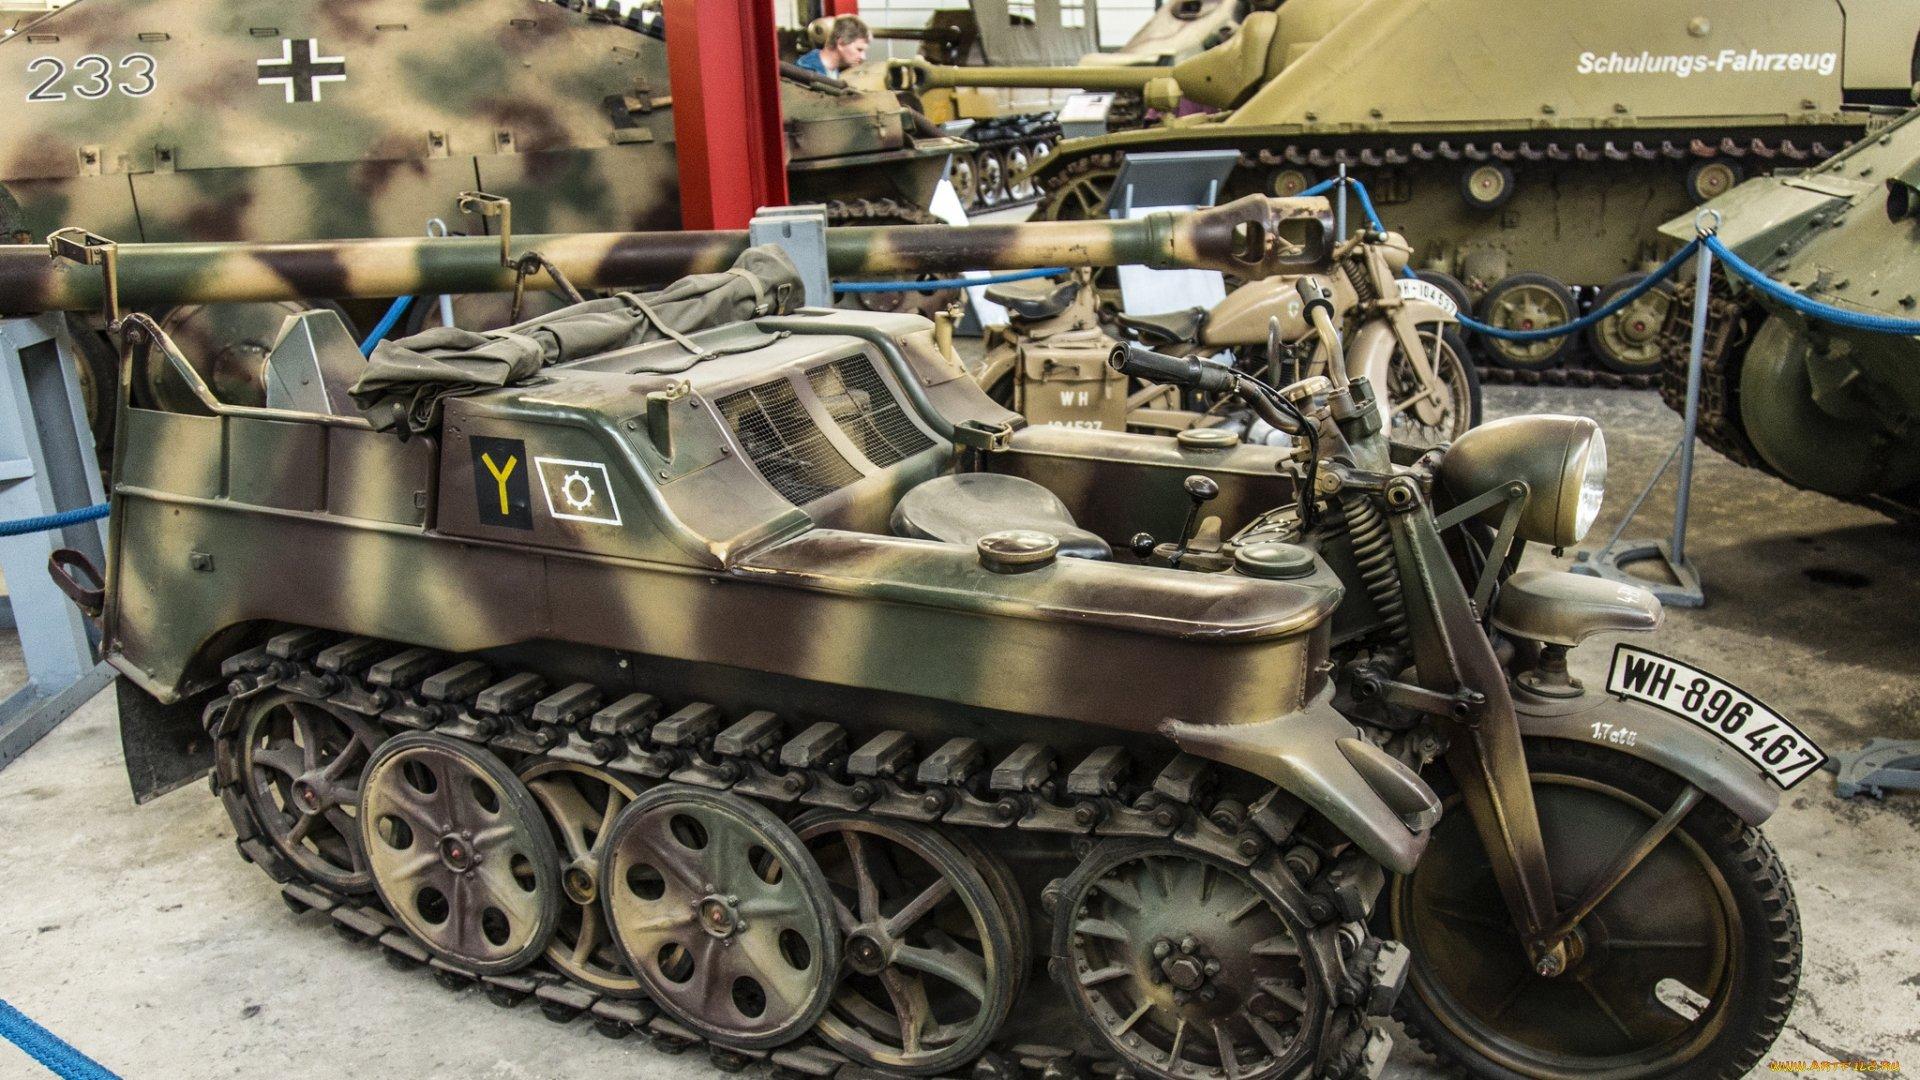 Motorcycle tank vehicle military wallpaper 1920x1080 1920x1080